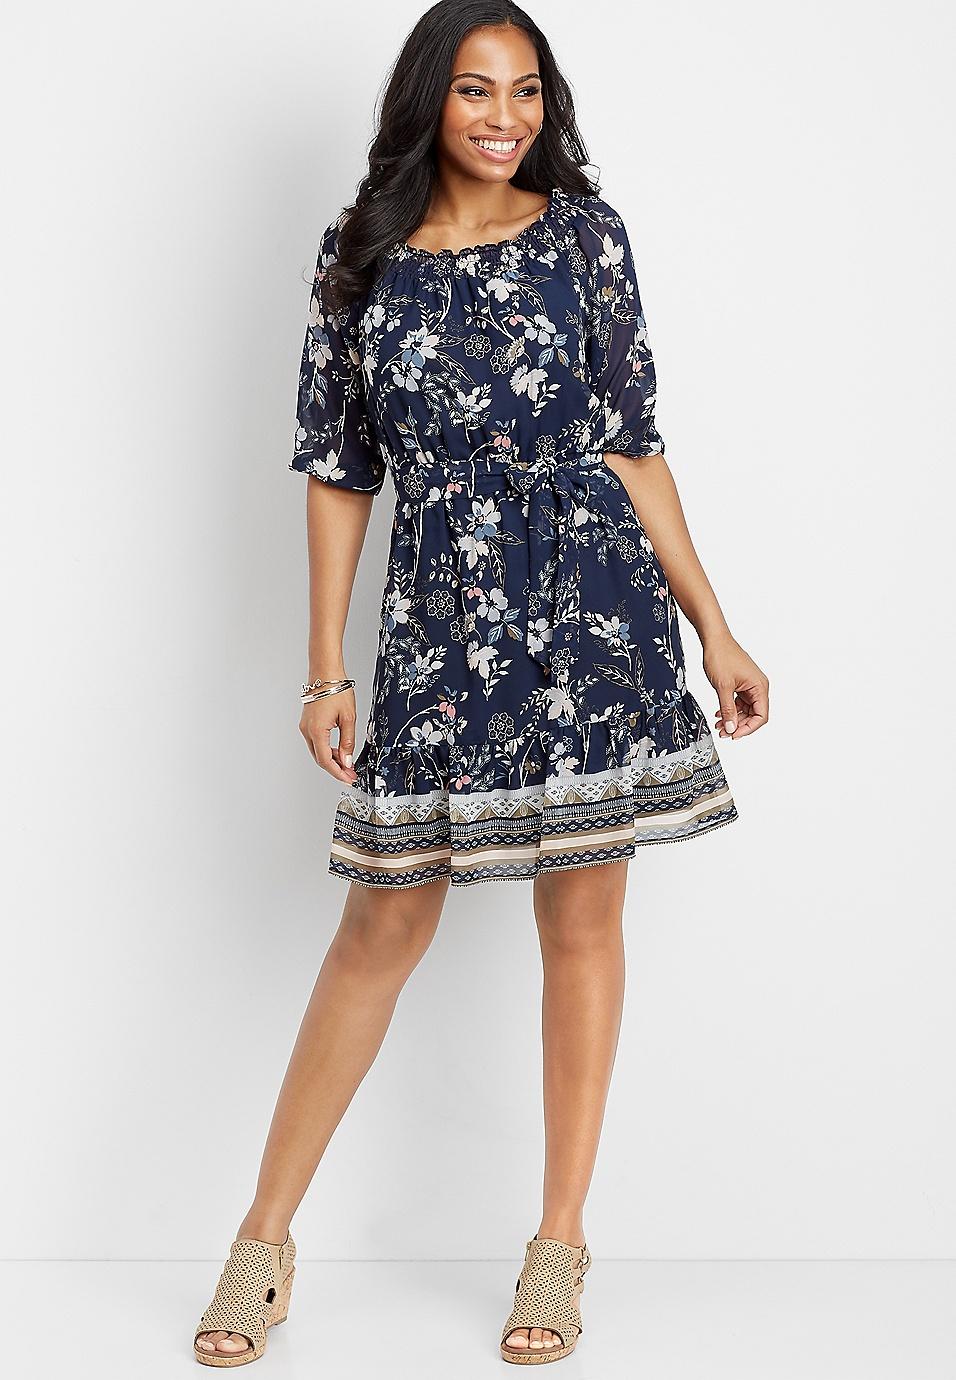 31fb1e1f6c5d4 off the shoulder floral patterned dress | maurices